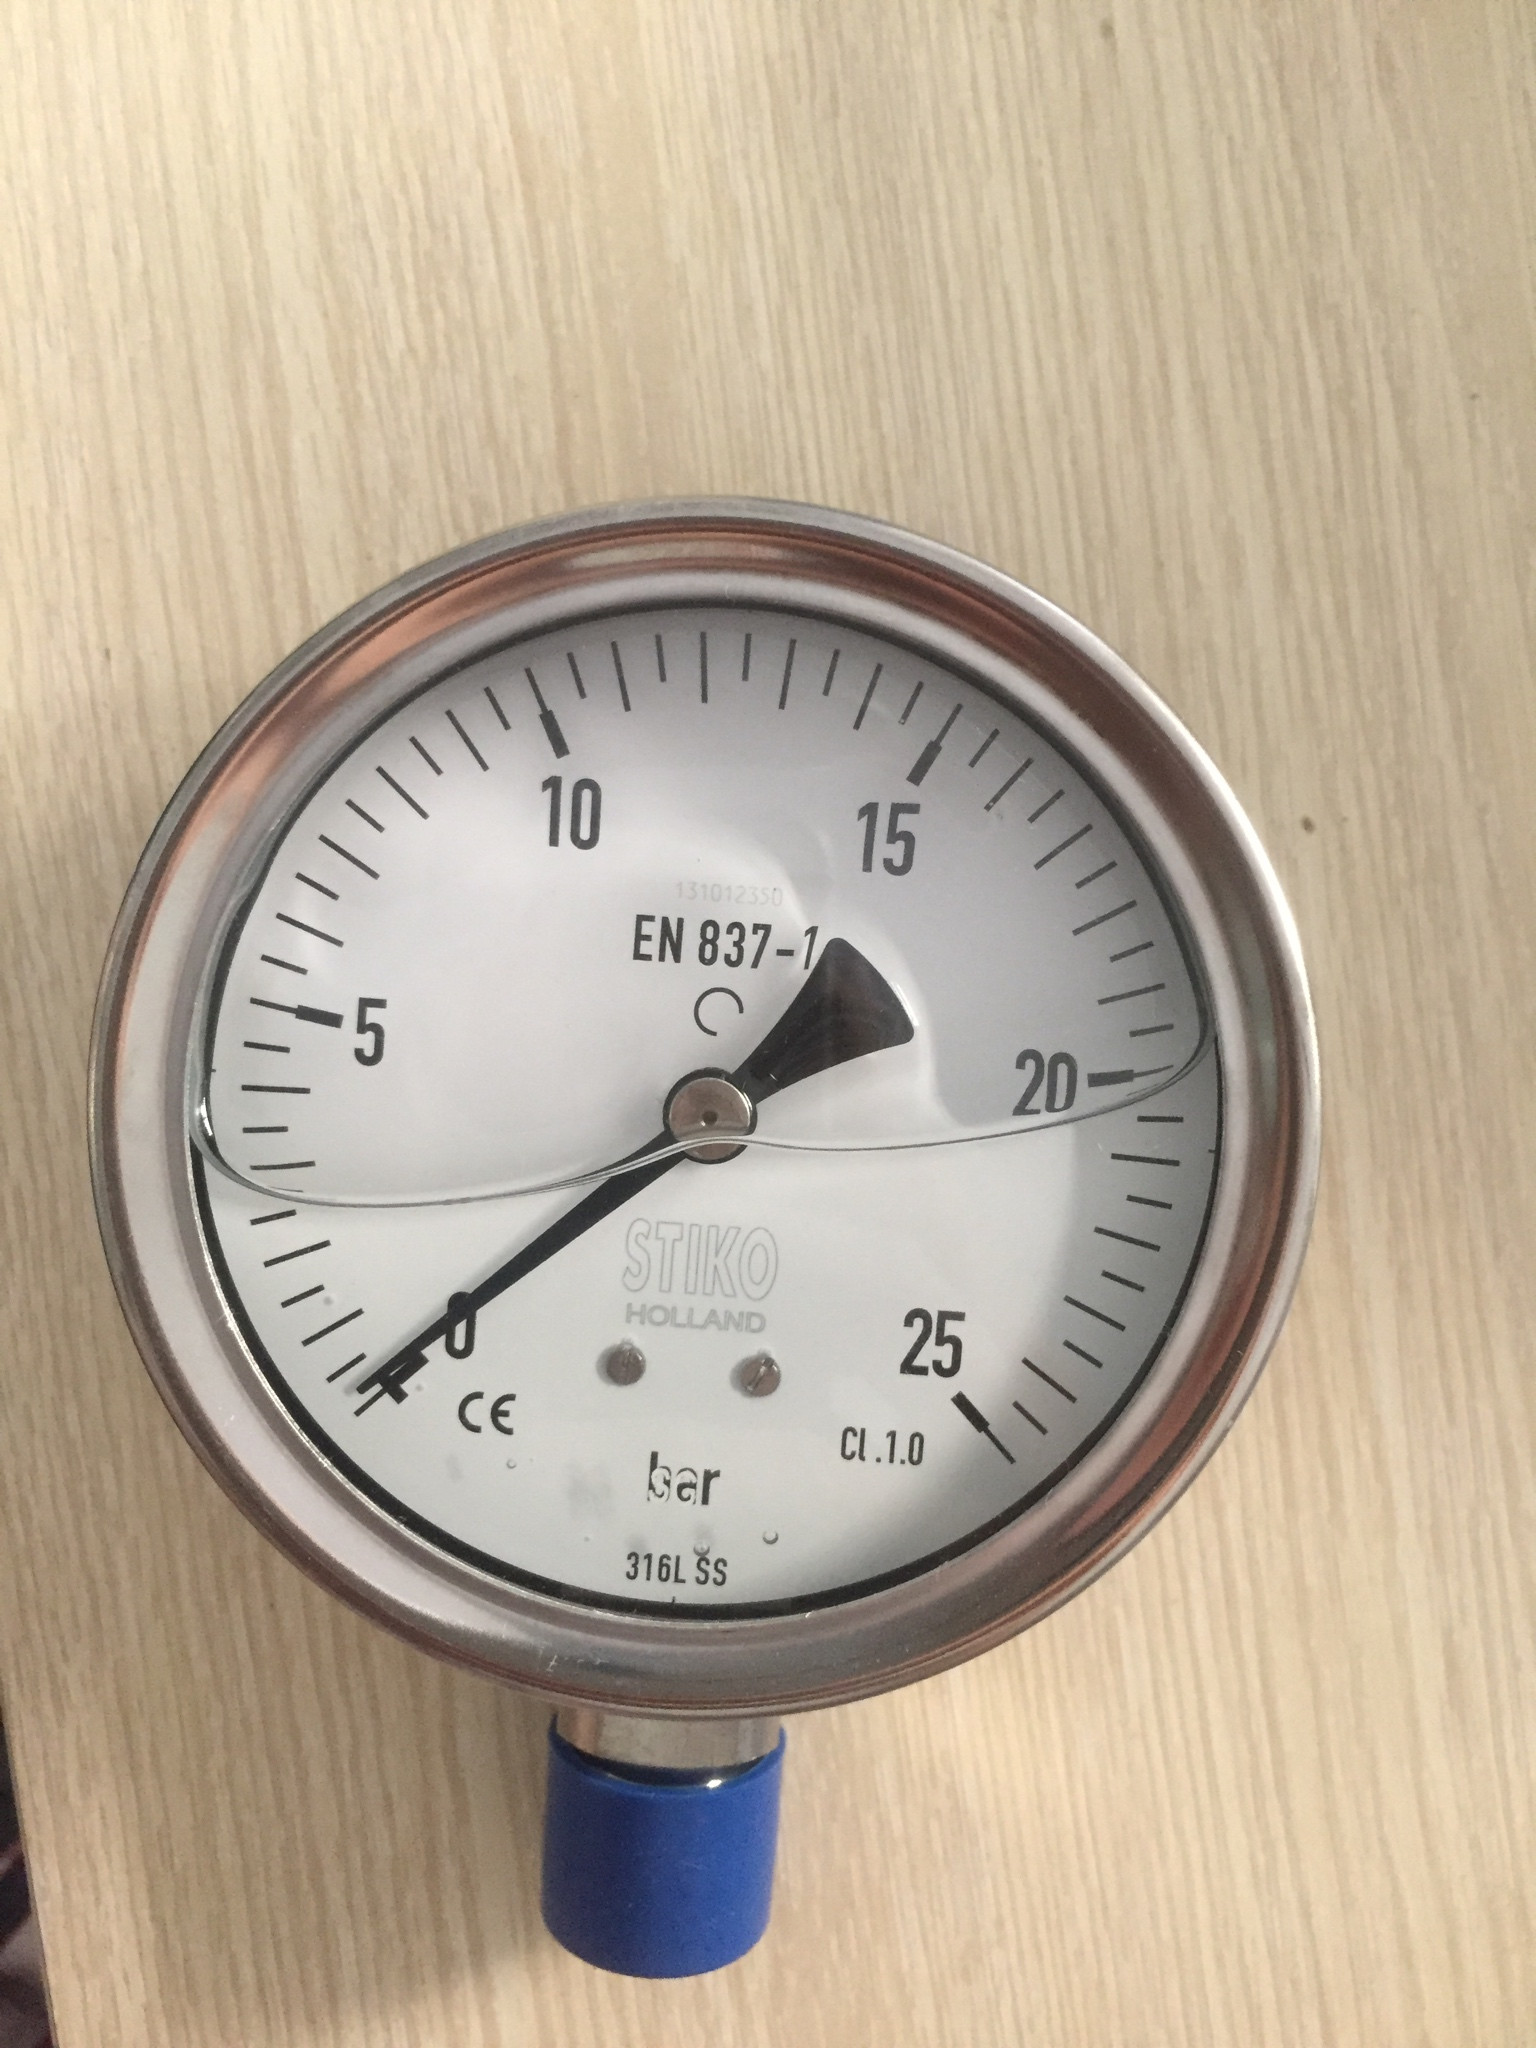 Đồng hồ đo áp suất 0-25 kg/cm2 ( 0-25bar )